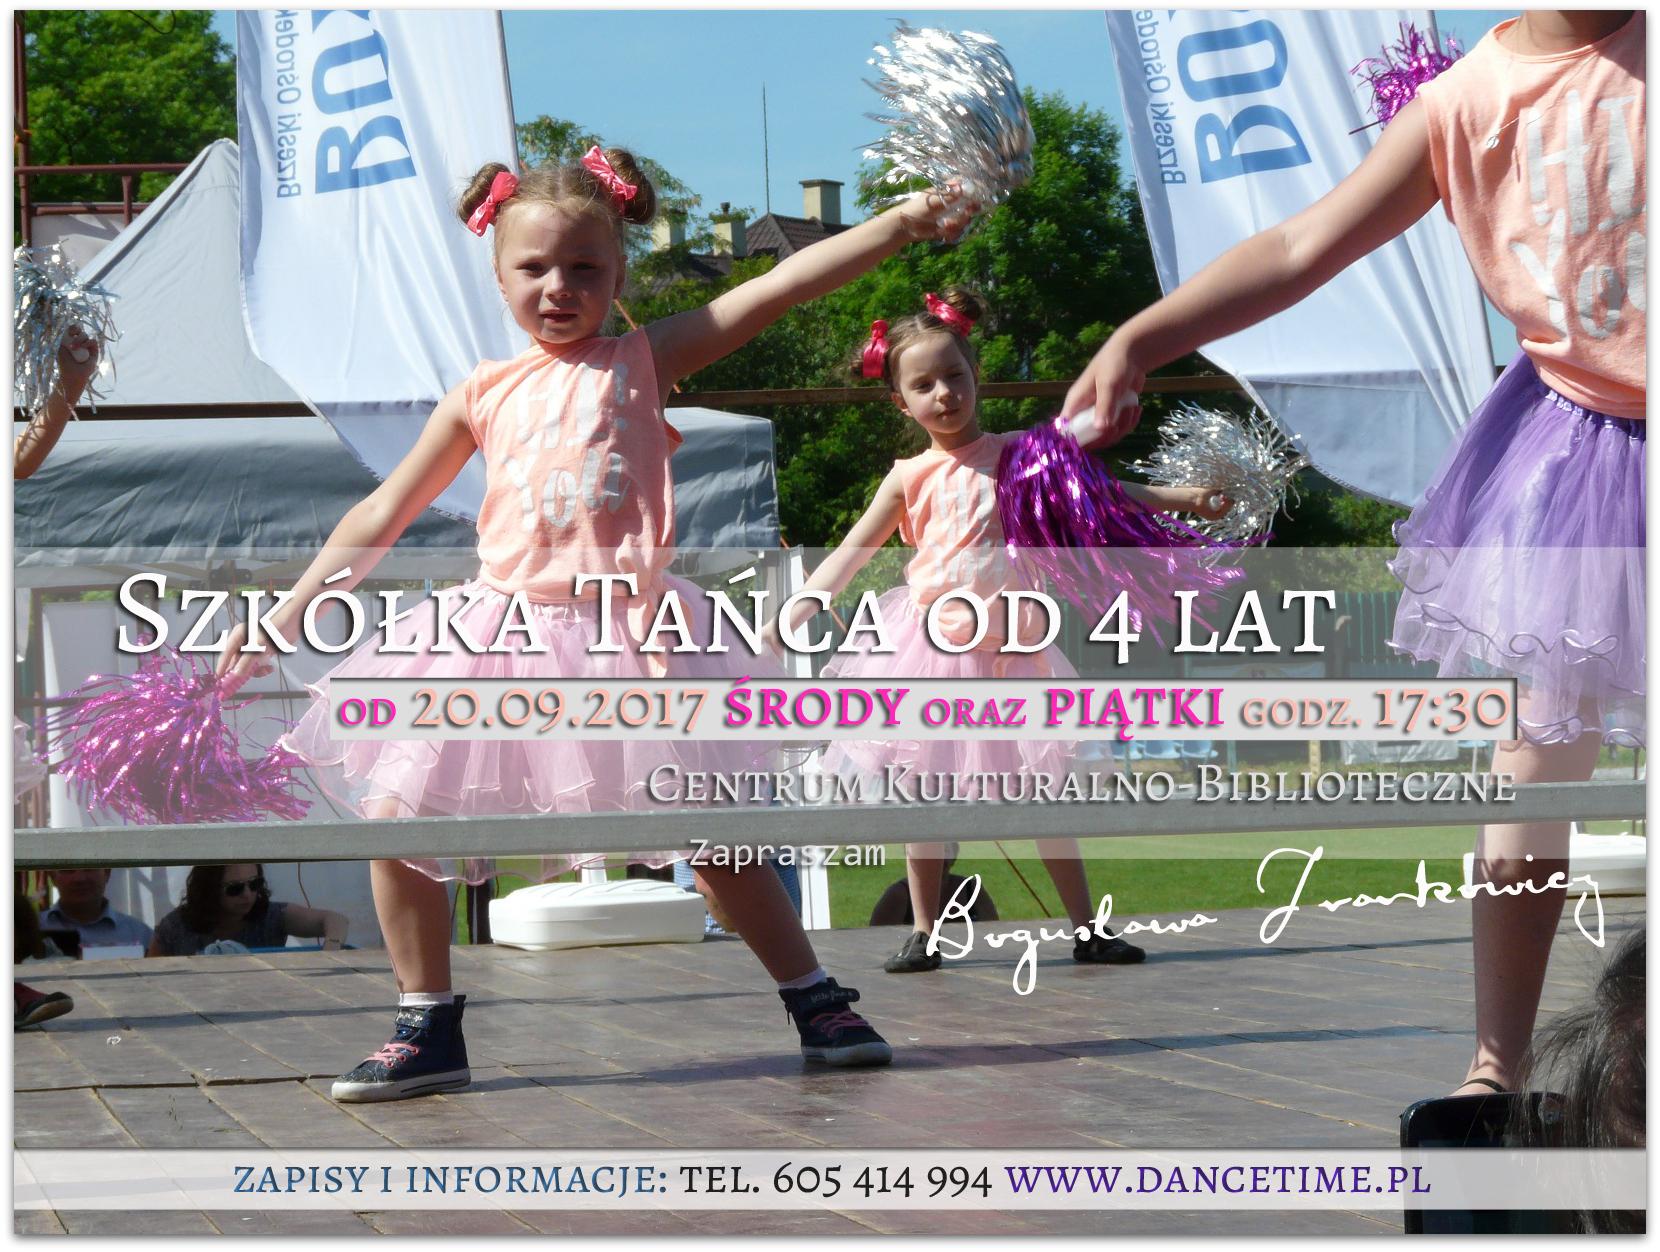 Szkółka Tańca Brzesko nowy sezon dancetime.pl